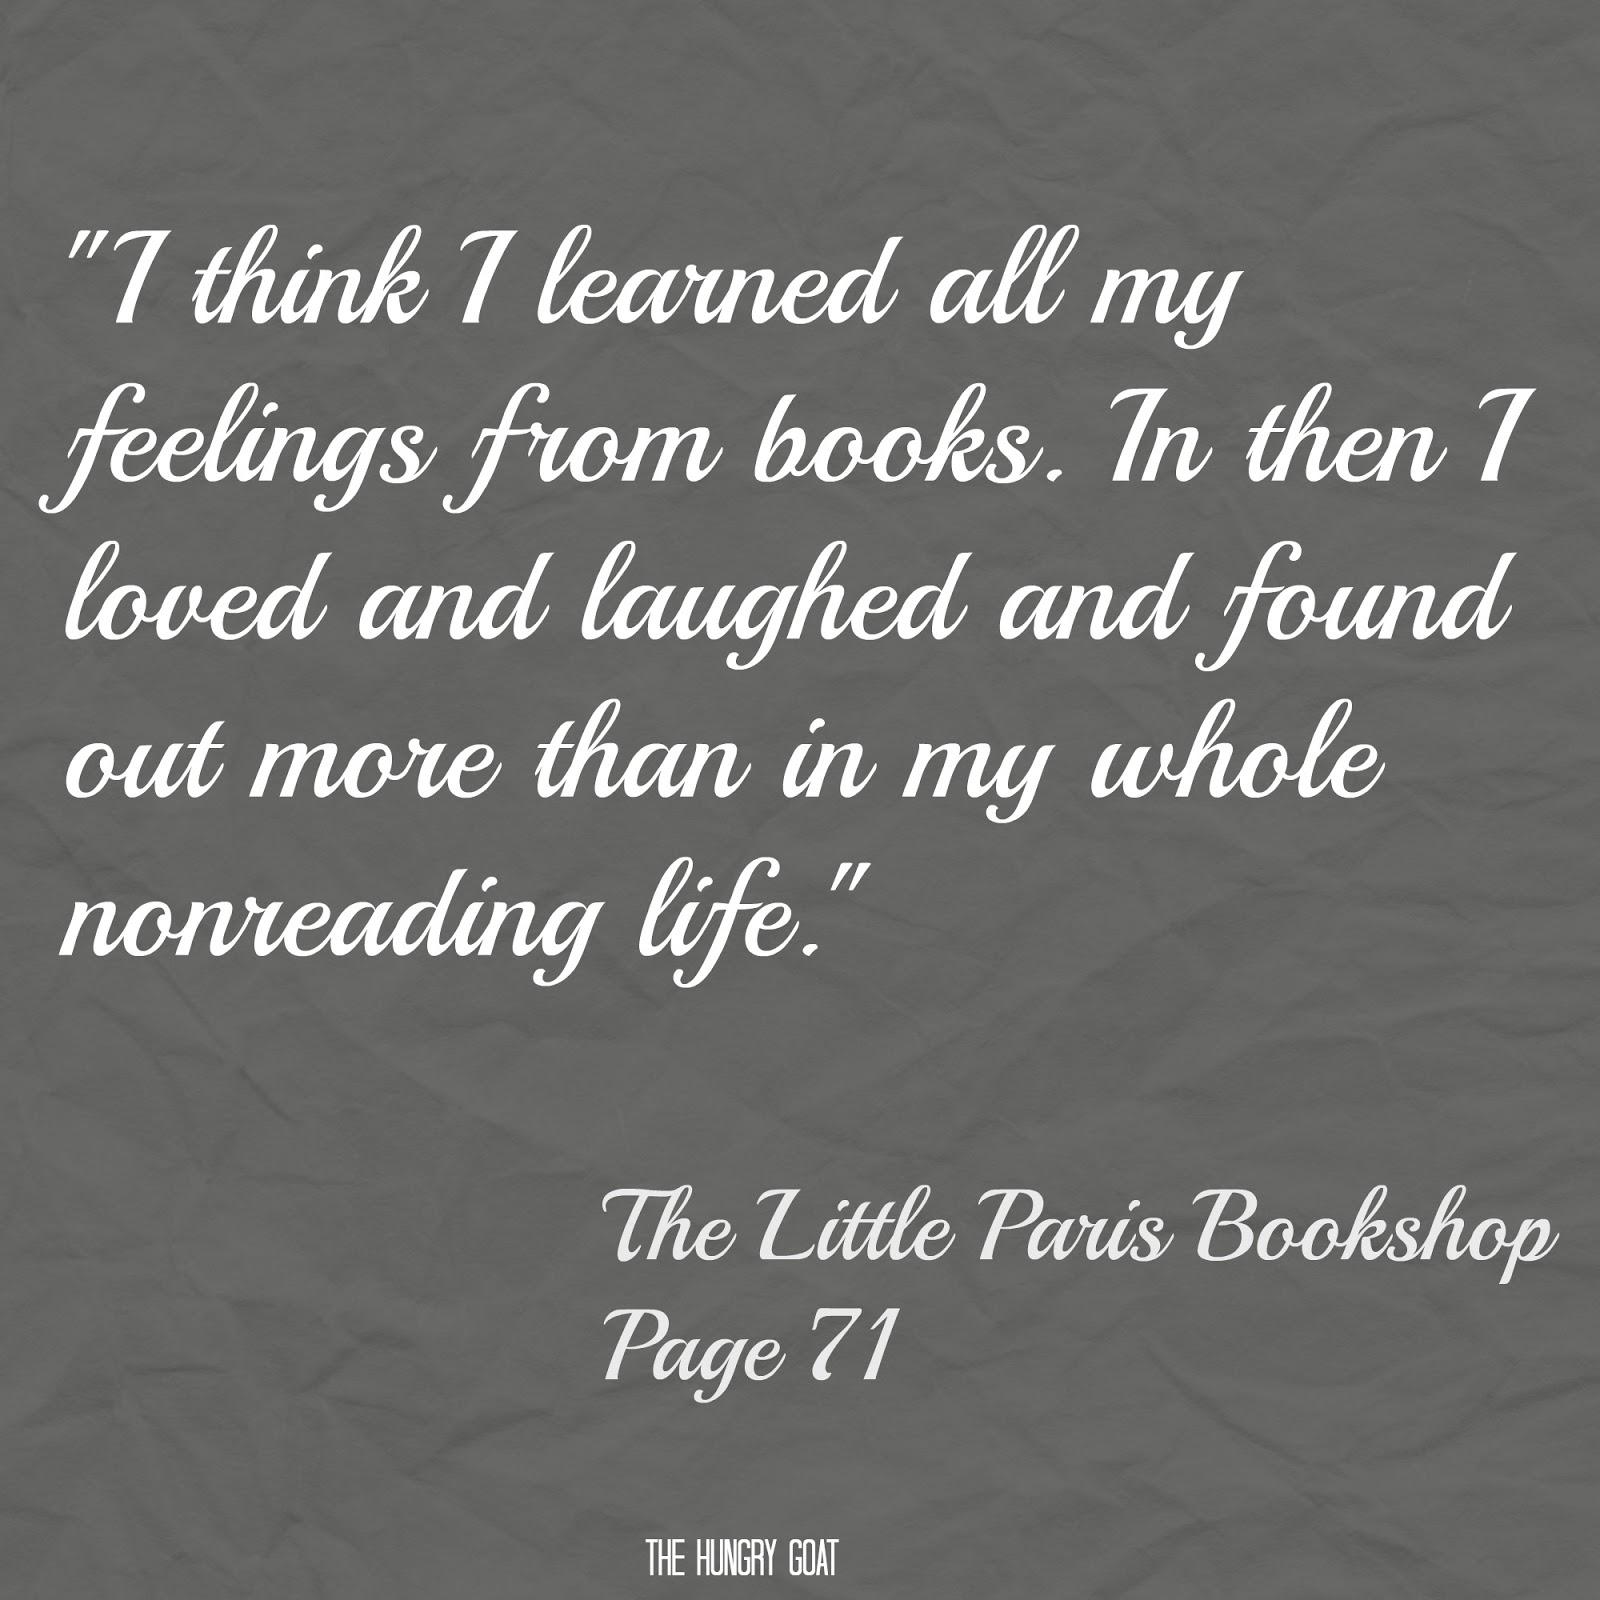 Top 10 Love Quotes Top 10 Tuesday Favorite Recent Book Quotes  Greenish Bookshelf